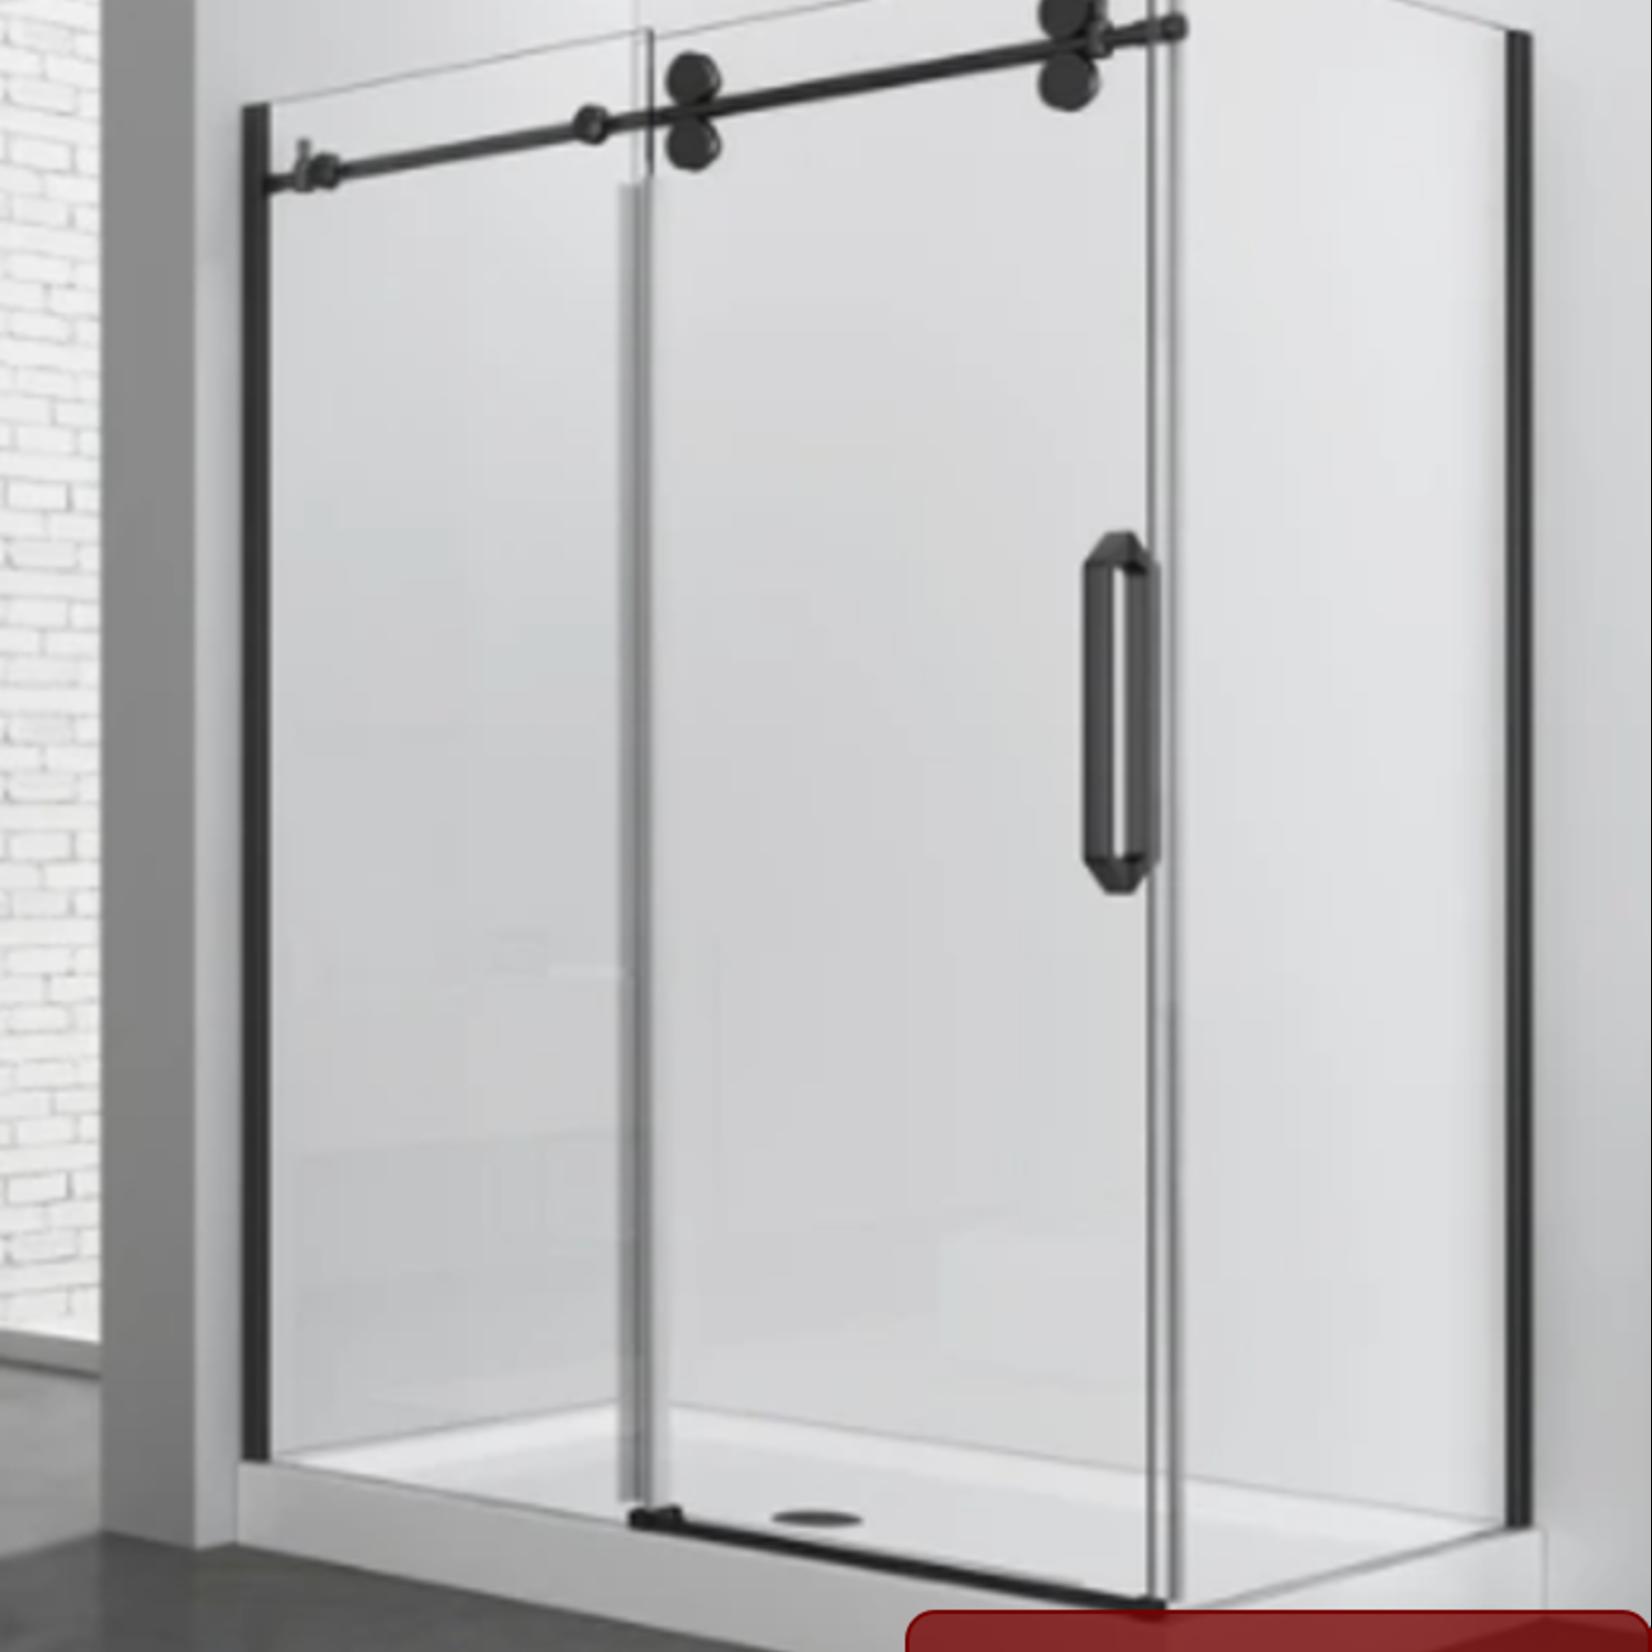 Reversible shower set 32x60 matt black Zirkon Apo series